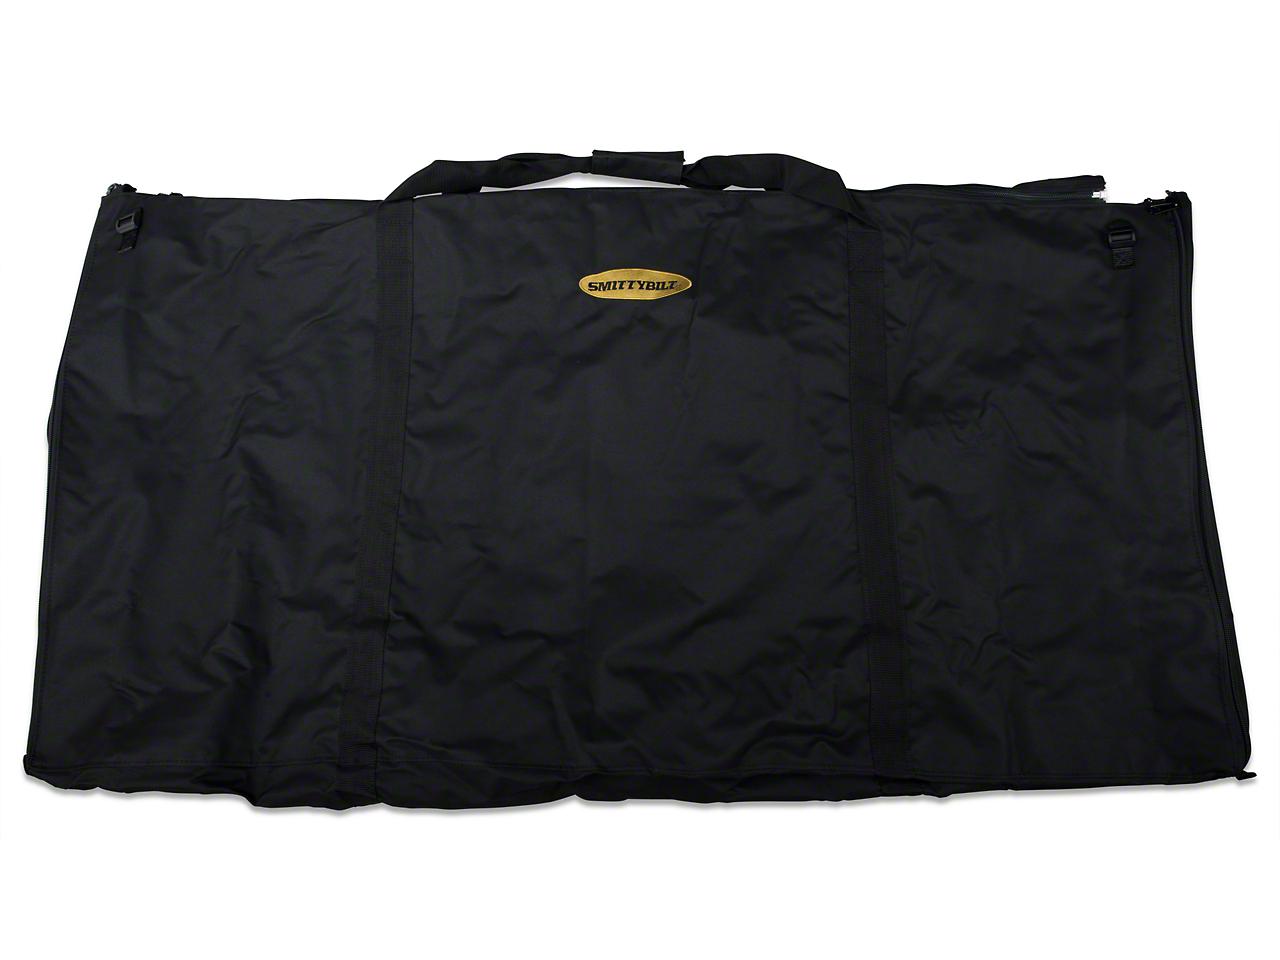 2018-2019 Jeep Wrangler Hard Top Panel and Soft Top Windows Storage Bag Case